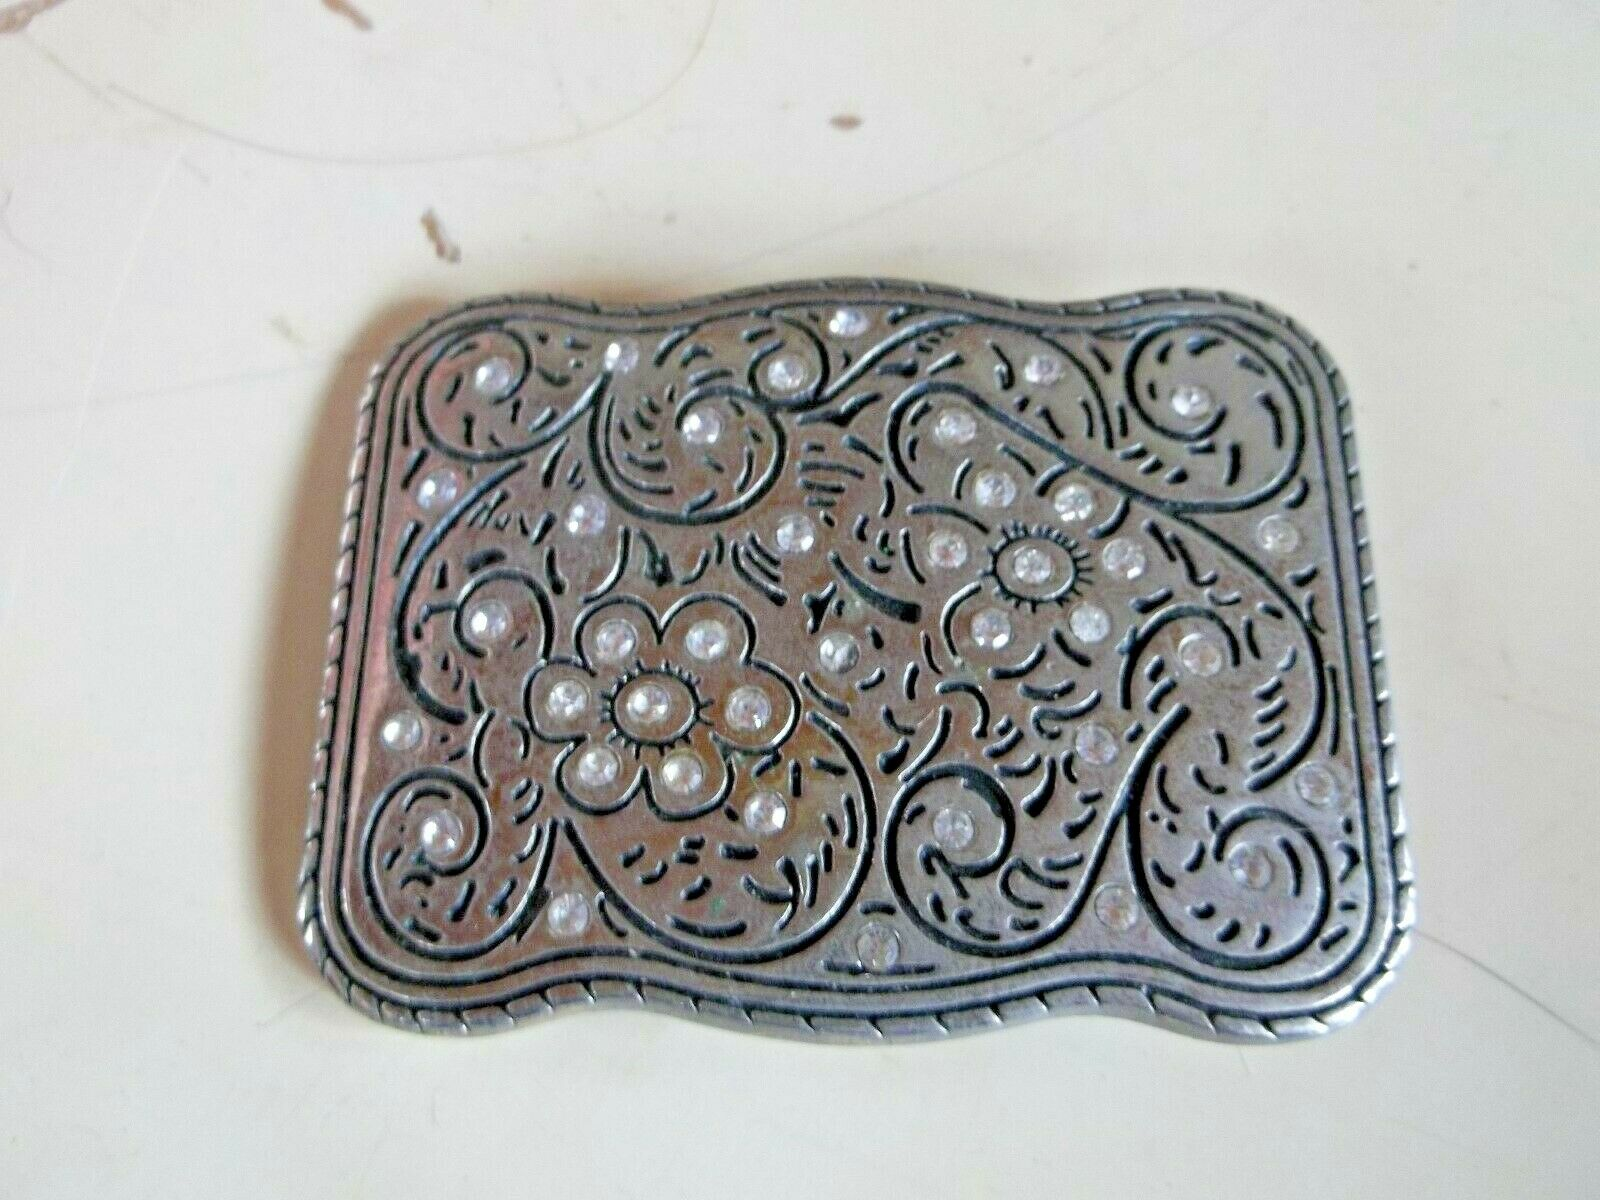 Silver and Crystal Spiral Flower Design Rectangular Woman's Belt Buckle